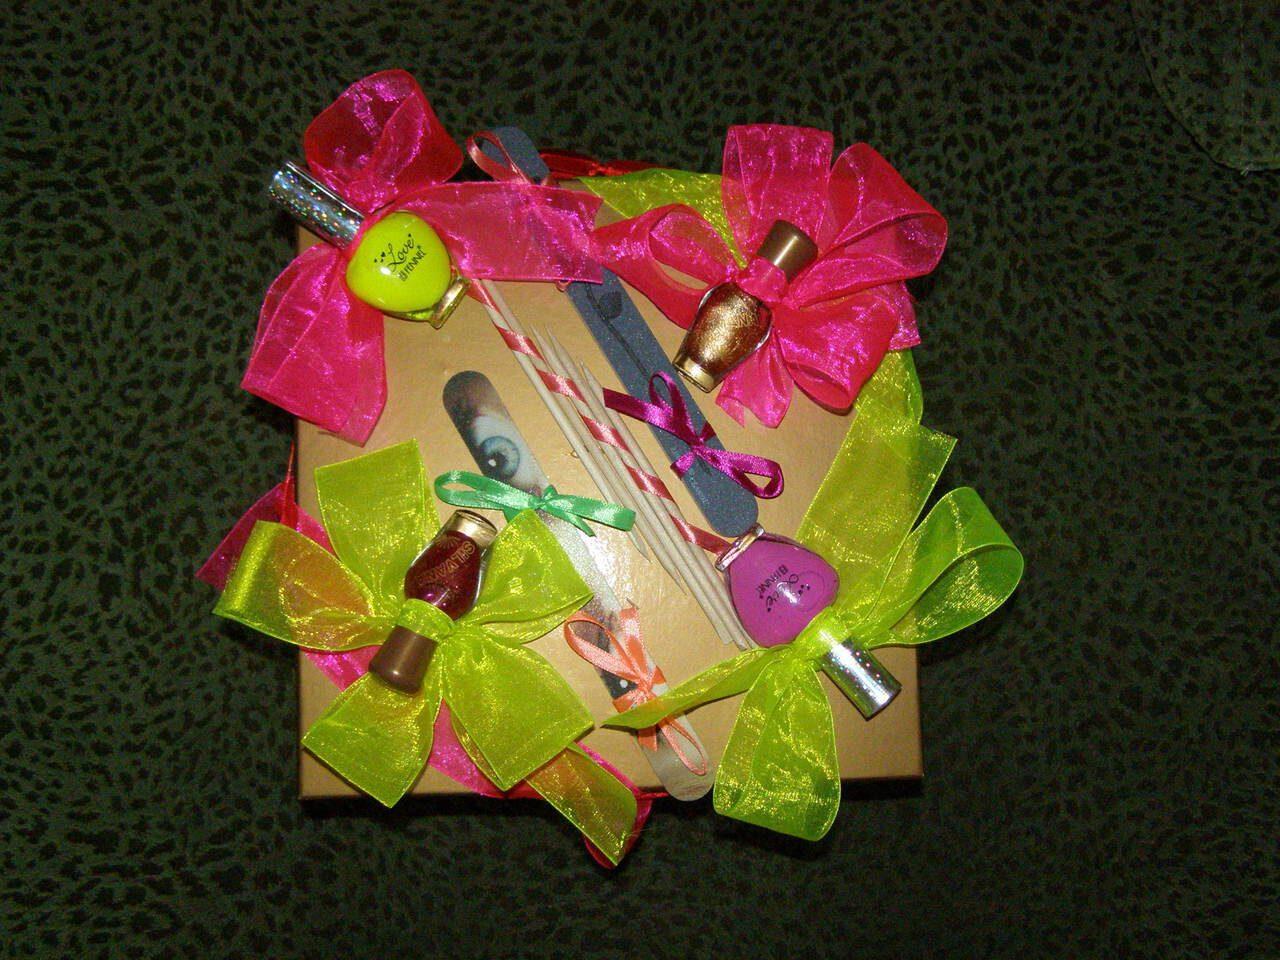 Подарки на день воспитателя идеи фото